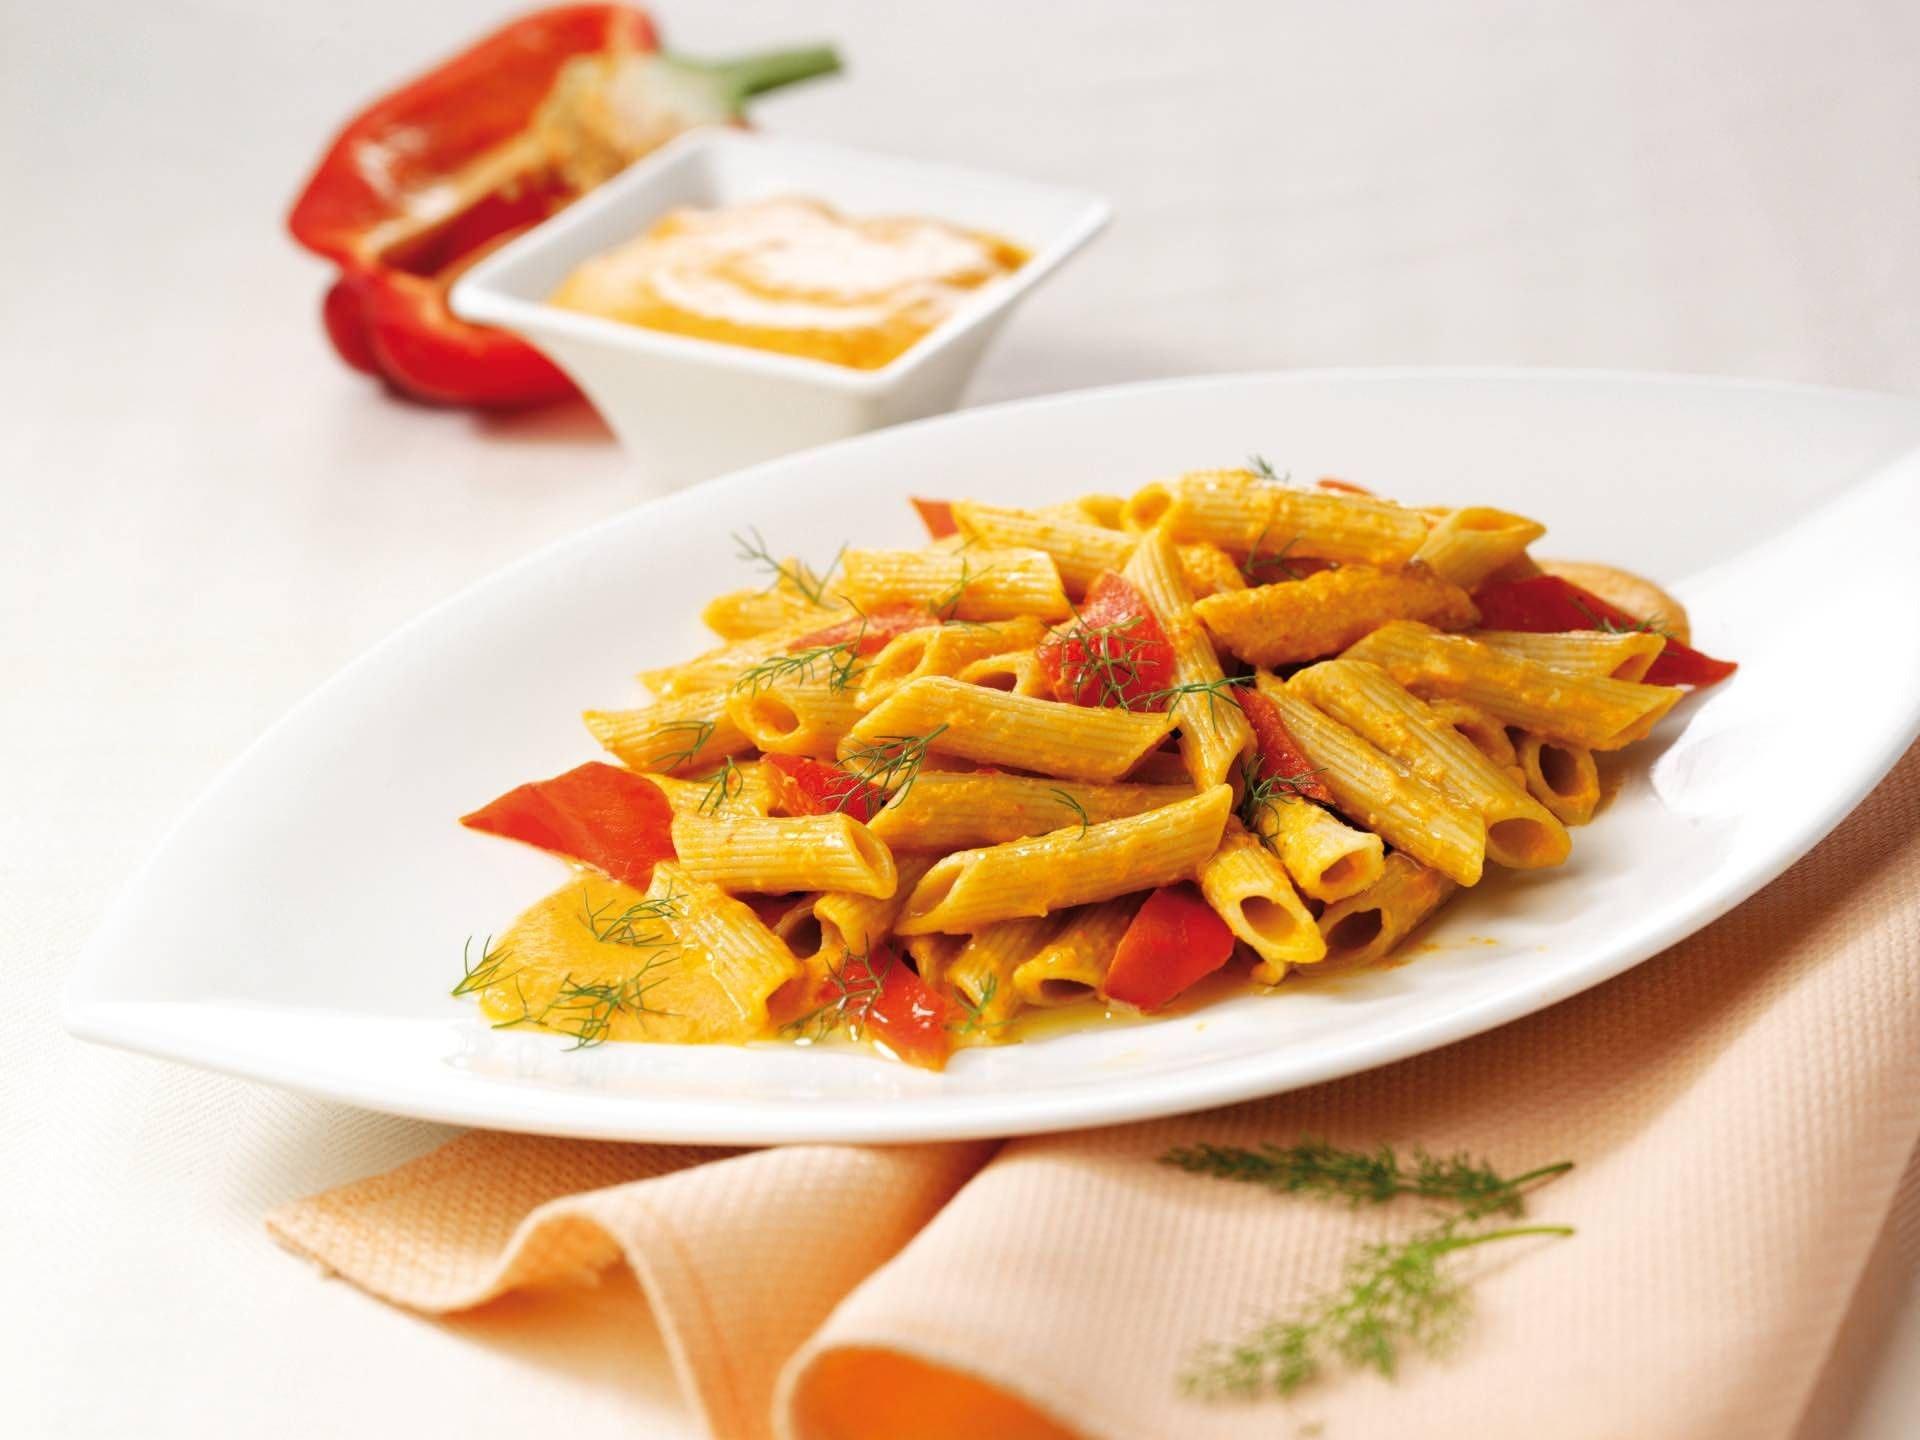 Penne integrali con fonduta di peperoni - Parmalat